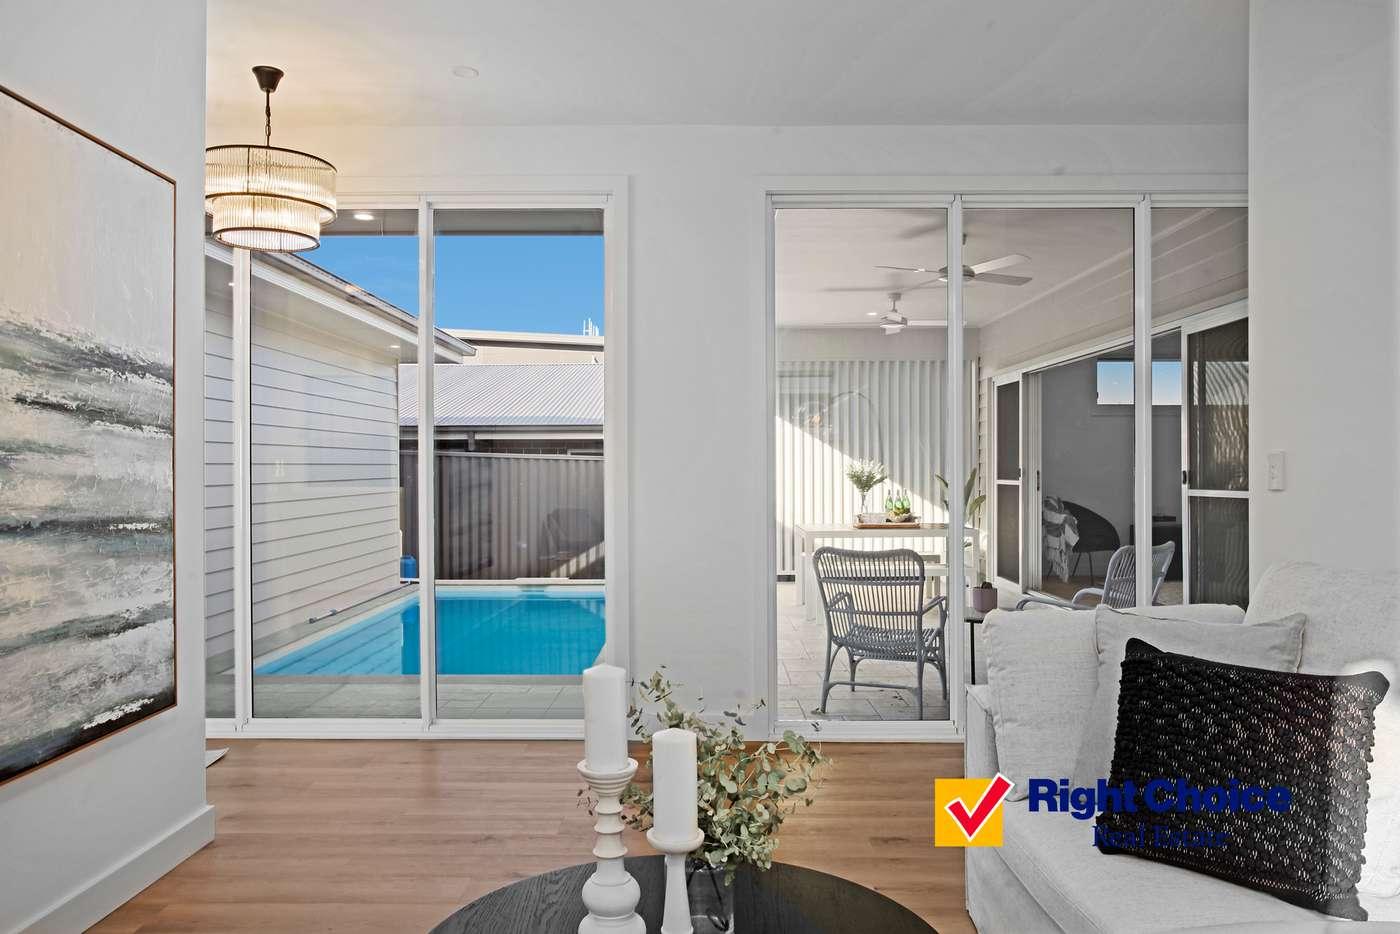 Seventh view of Homely house listing, 57 Saddleback Crescent, Kembla Grange NSW 2526